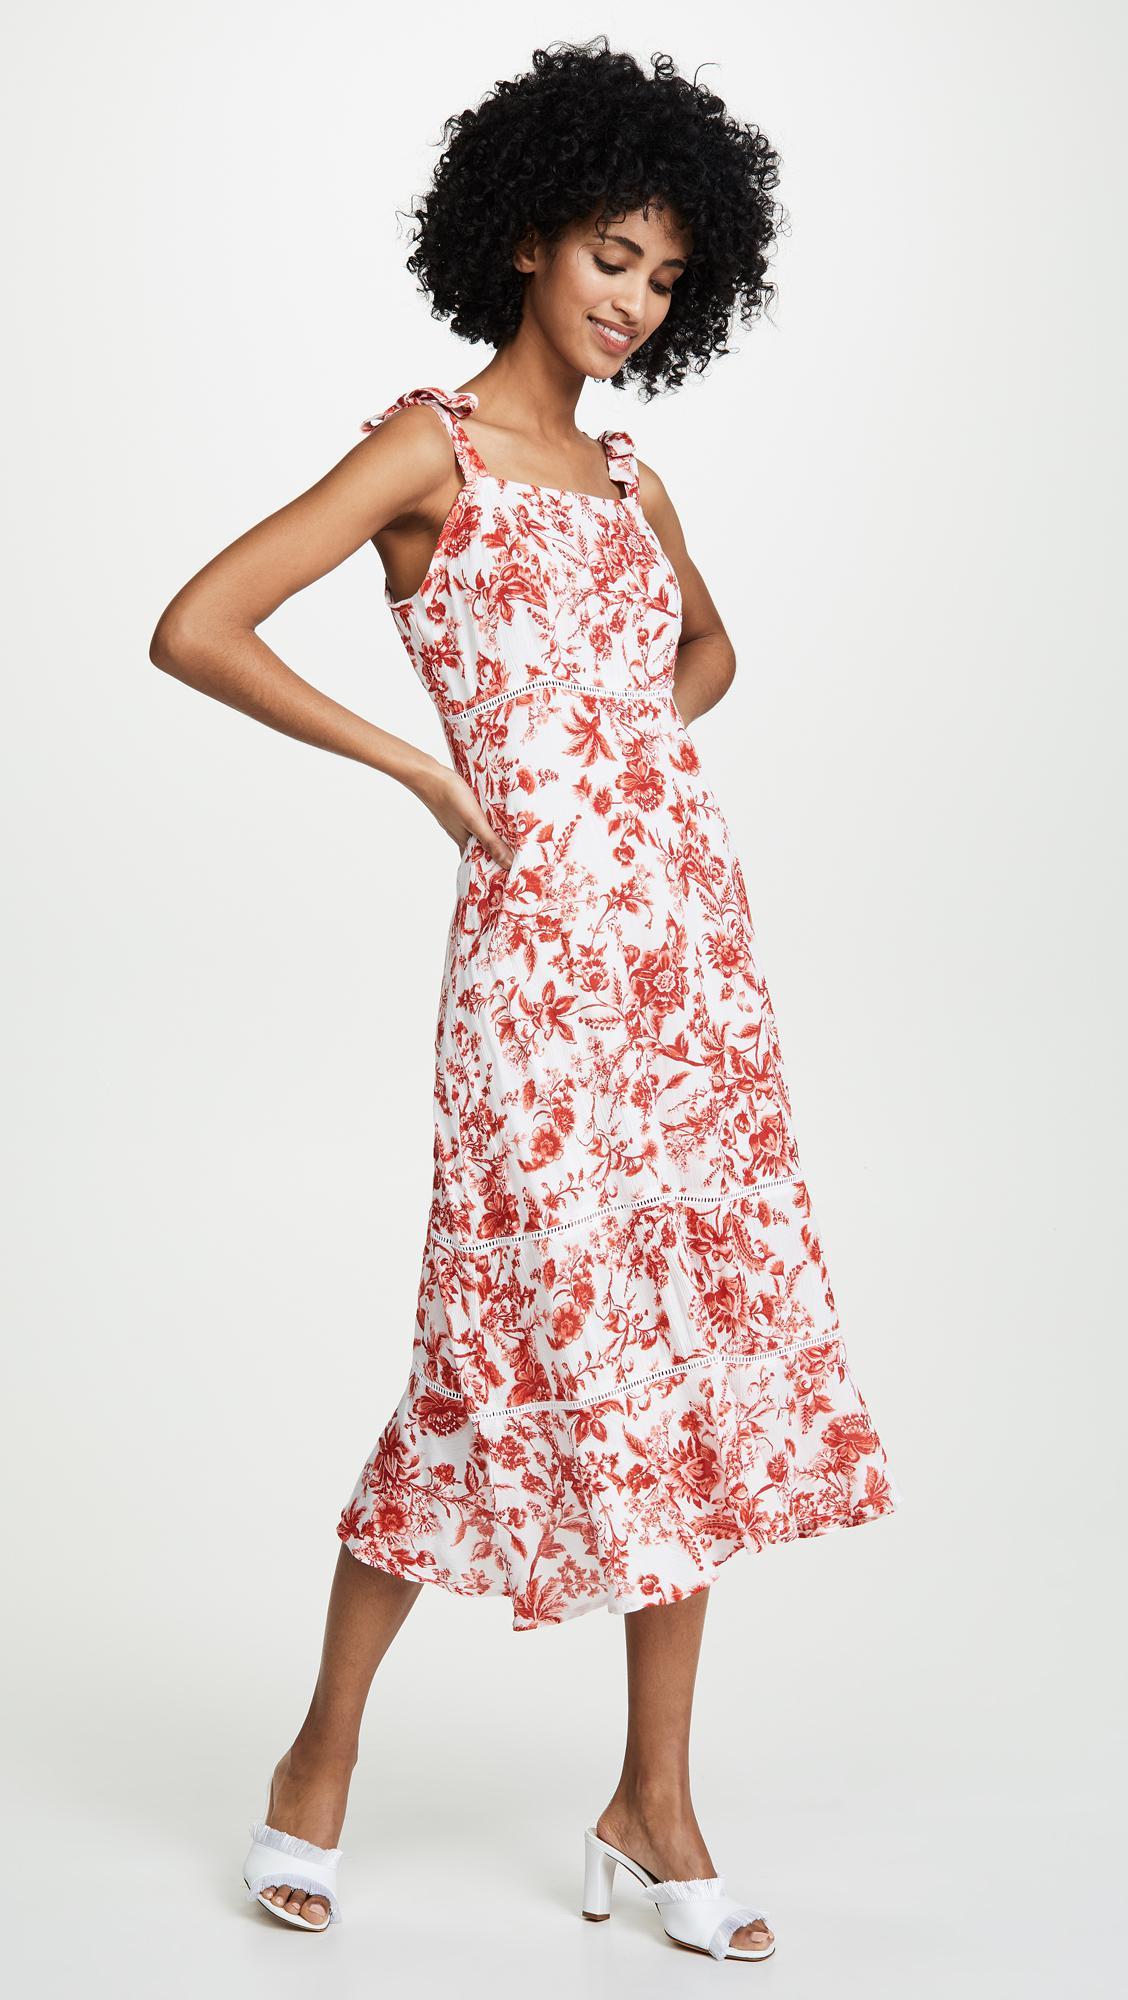 ead7ac9e01f Valencia   Vine Clarisse Dress in Red - Lyst